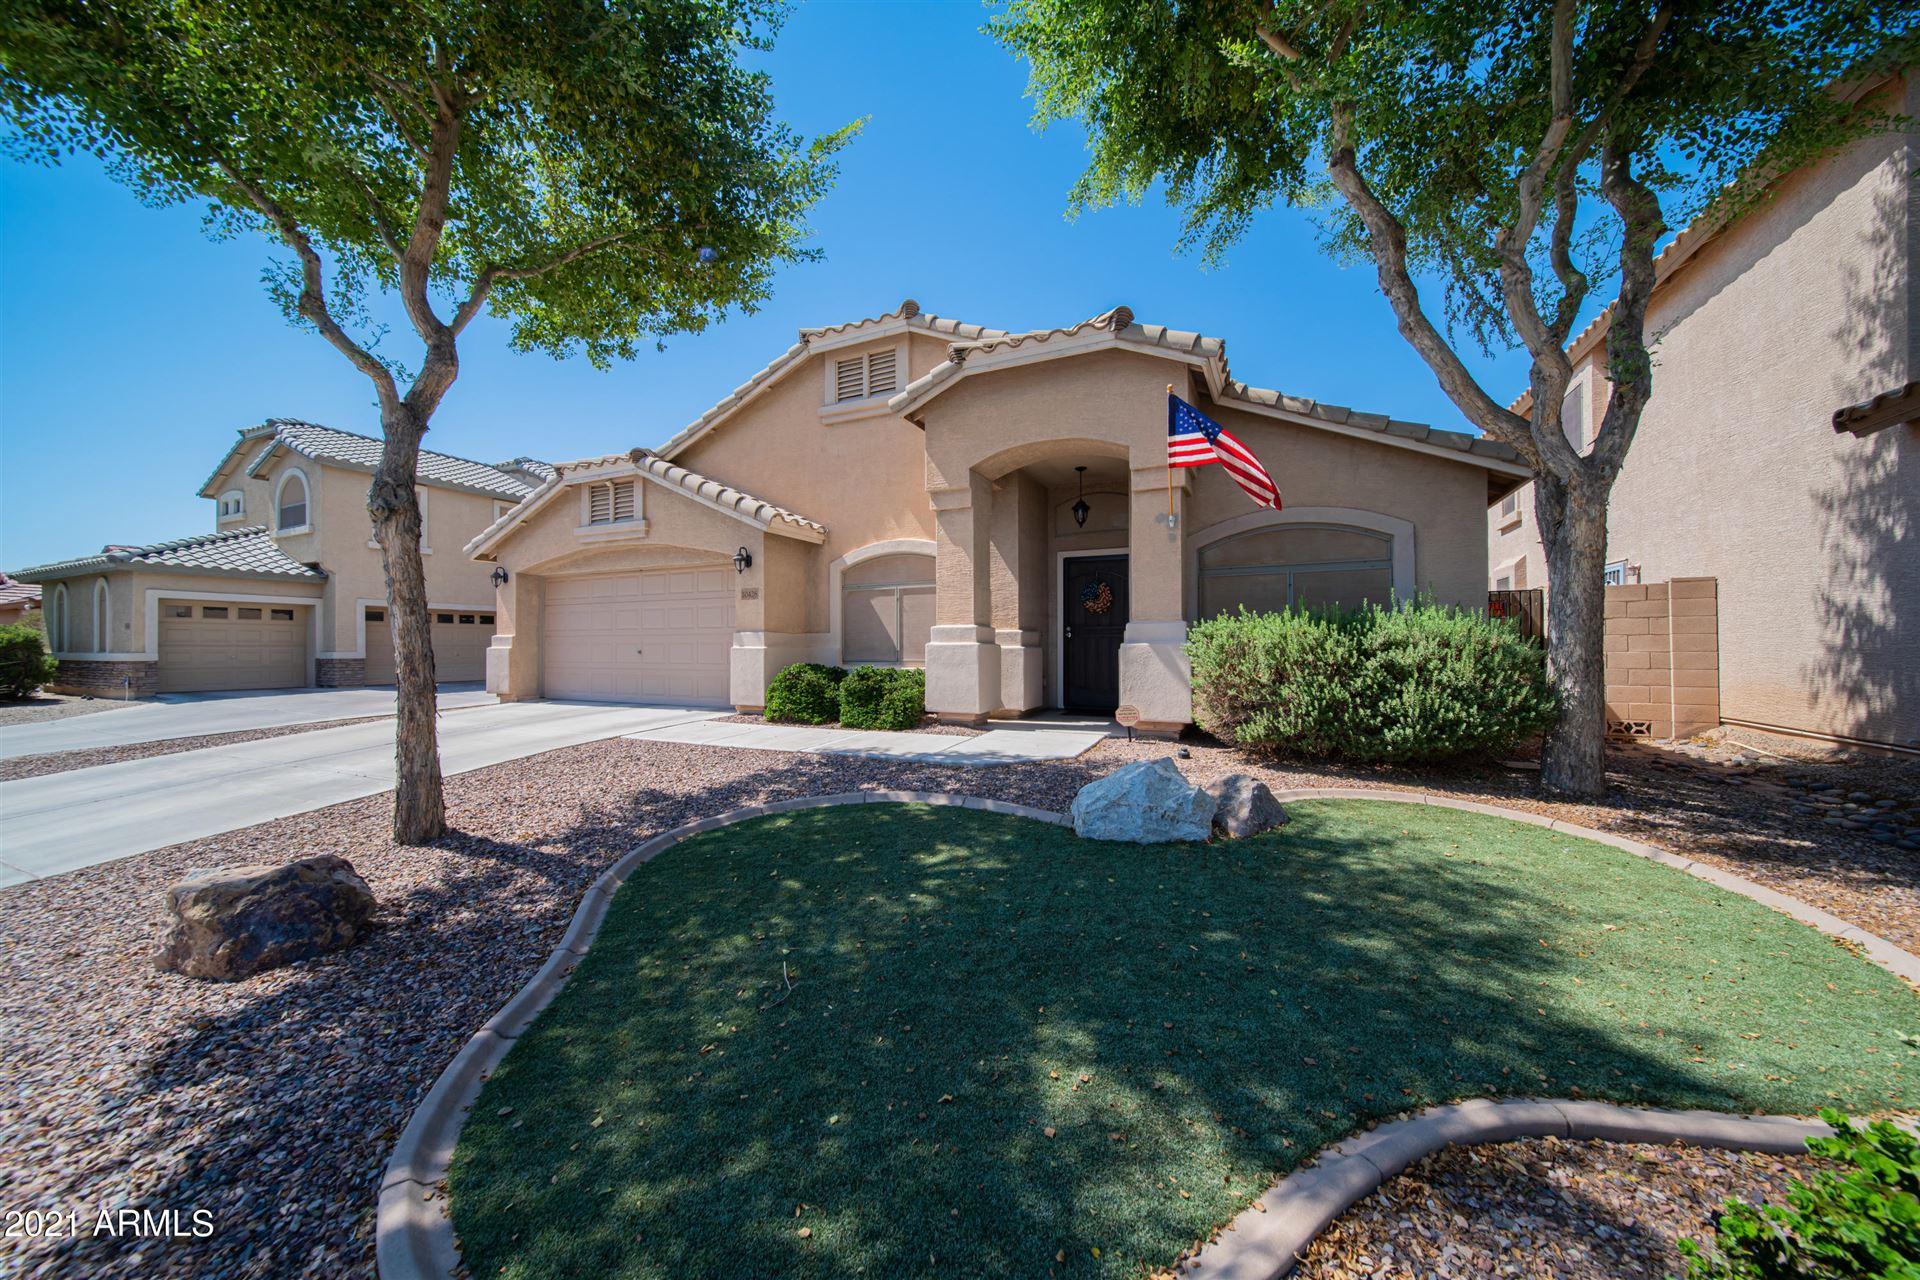 Photo of 10426 W ILLINI Street, Tolleson, AZ 85353 (MLS # 6265248)